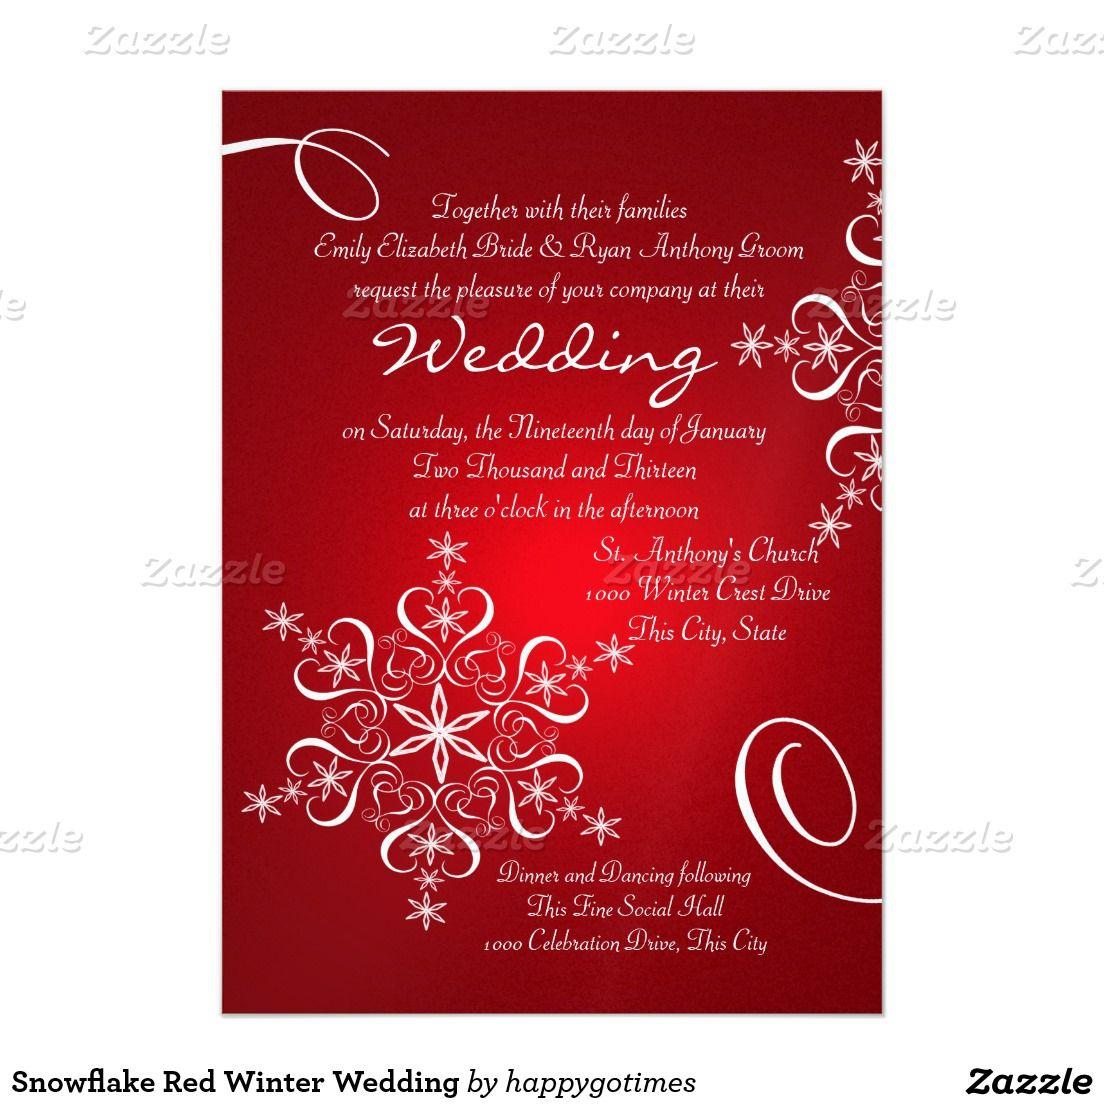 Snowflake Red Winter Wedding Invitation   Pinterest   Red winter ...